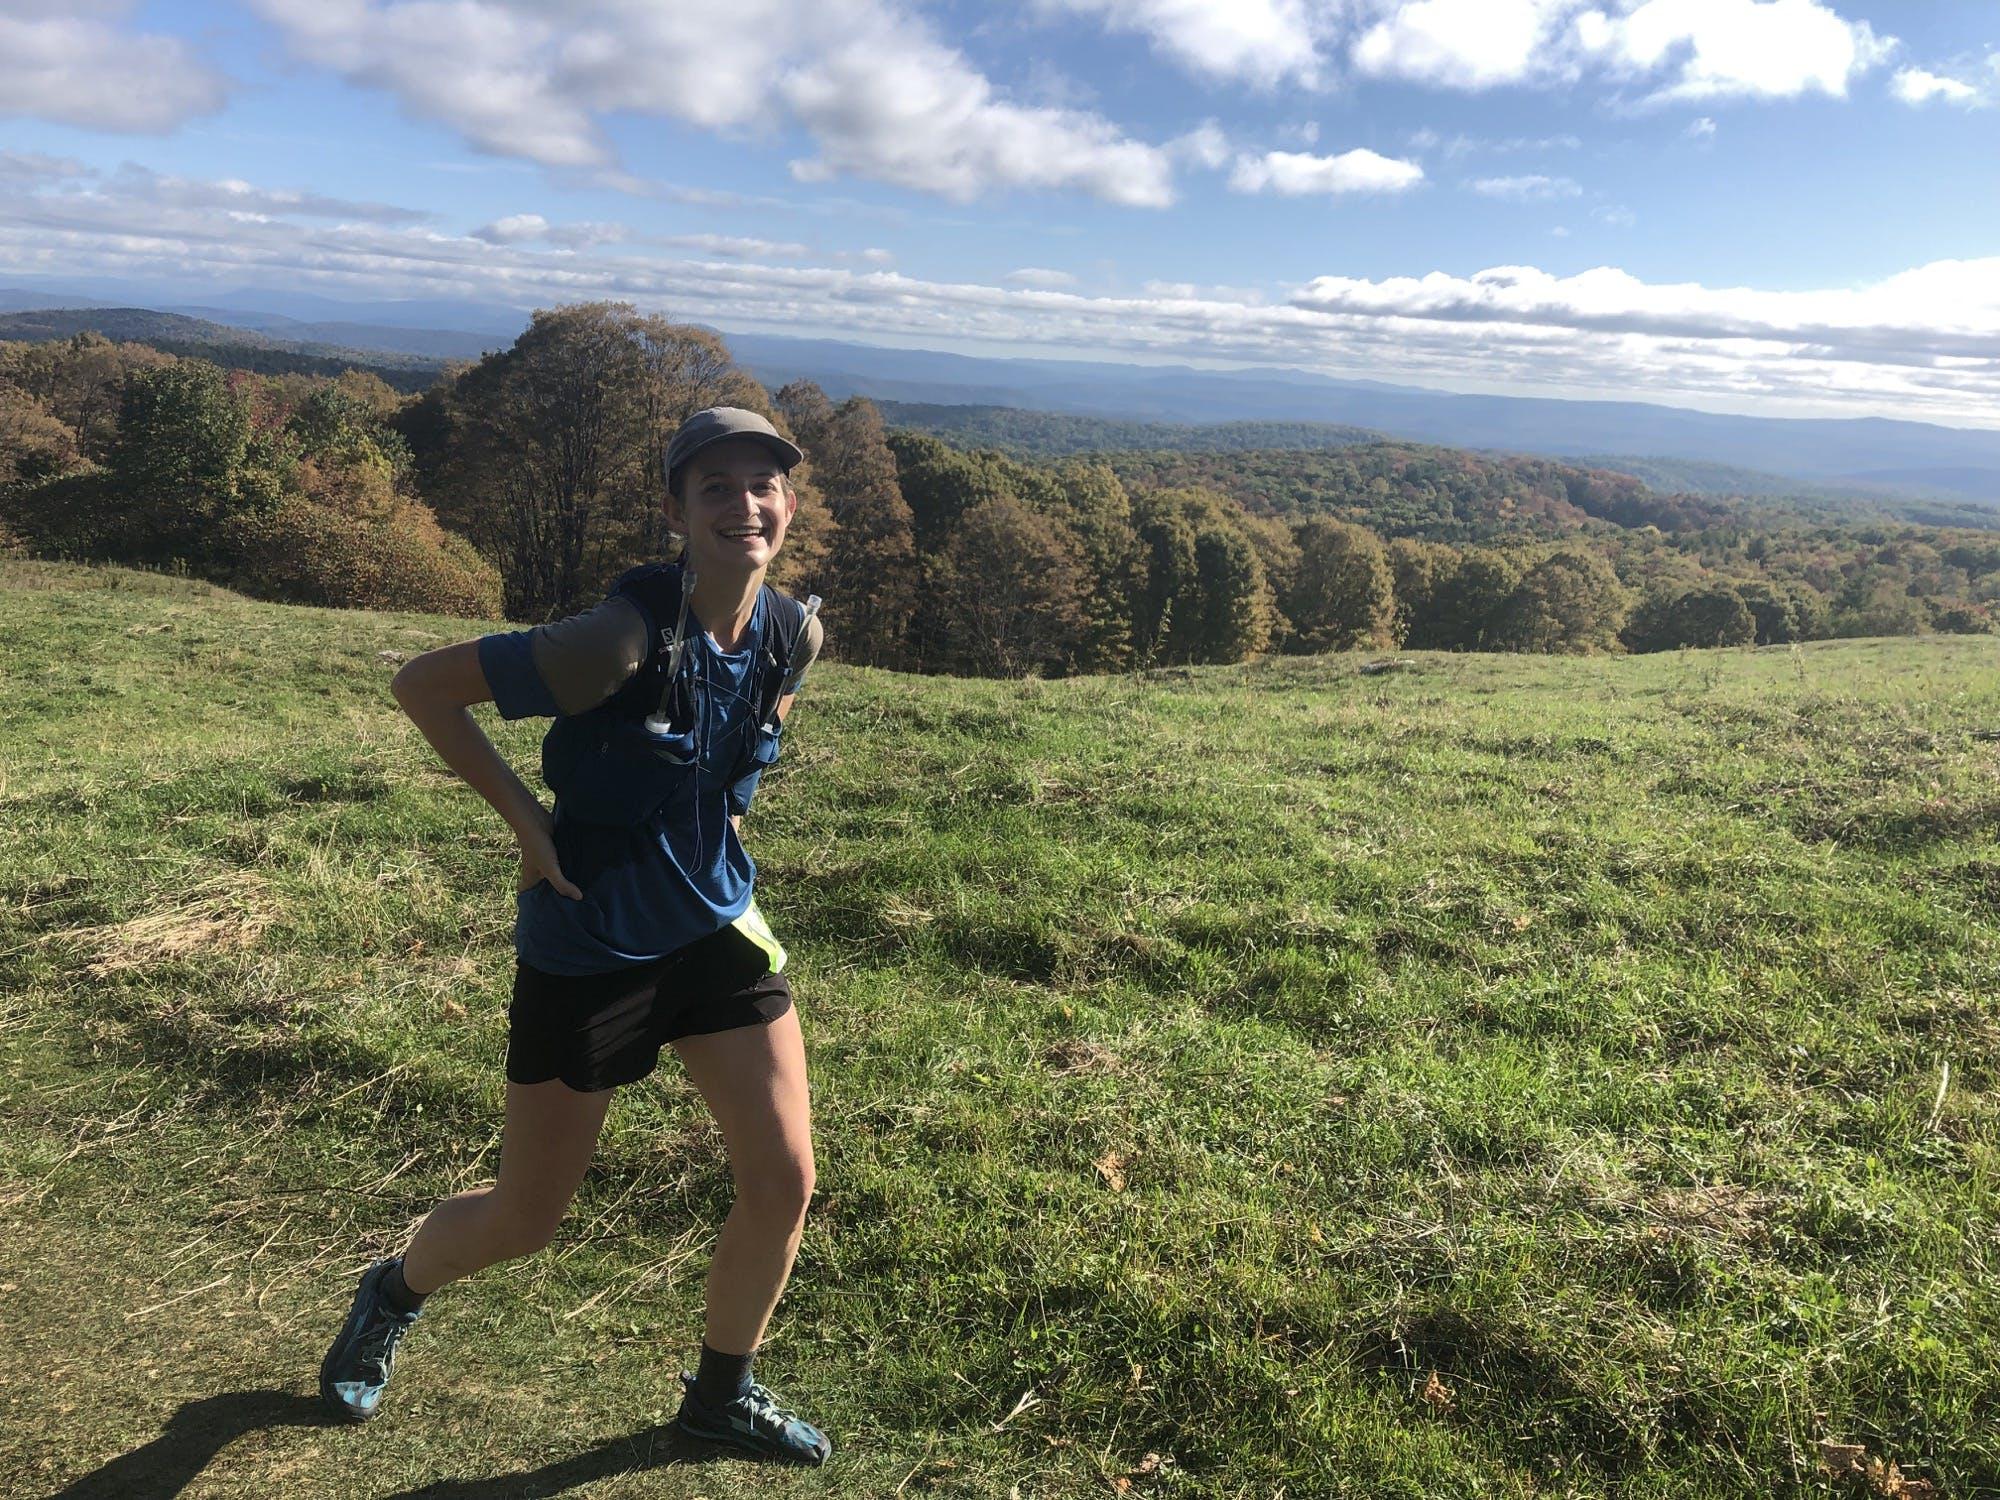 Climbing Garvin Hill. Photo: Leah Todd